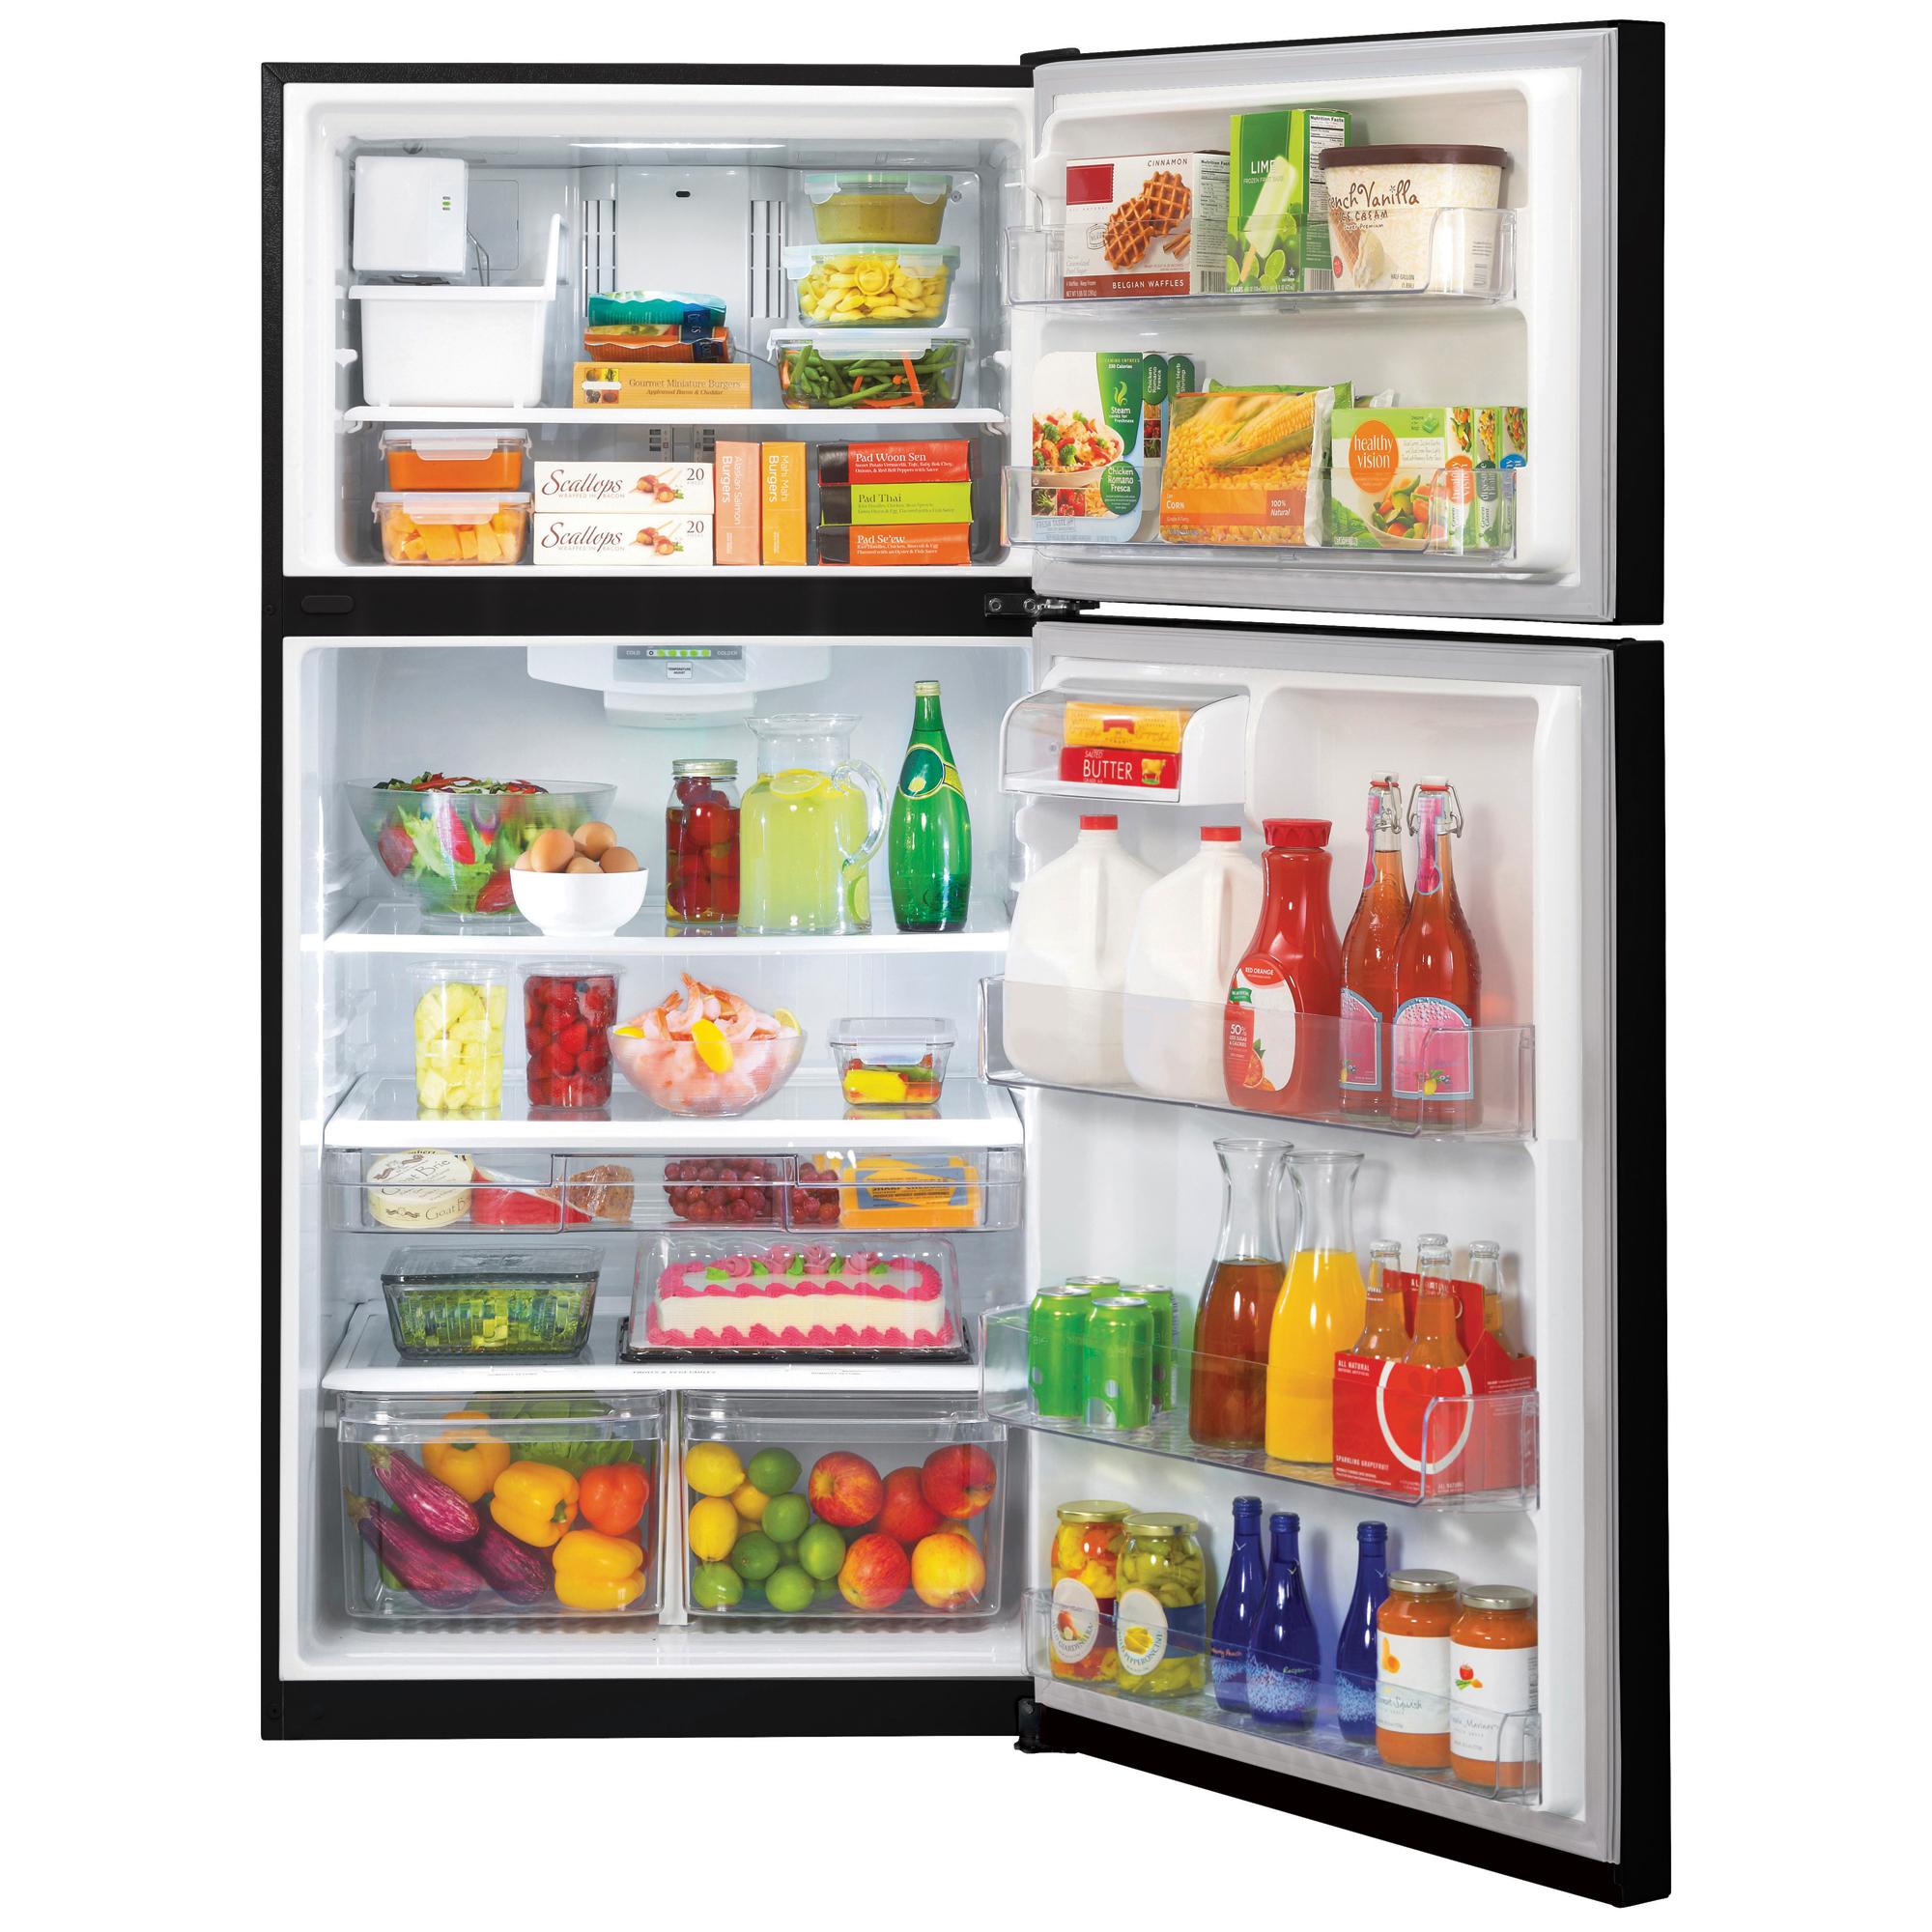 "LG LTCS24223B 23.8 cu. ft. 33"" Wide Top Freezer Refrigerator w/ Ice Maker"